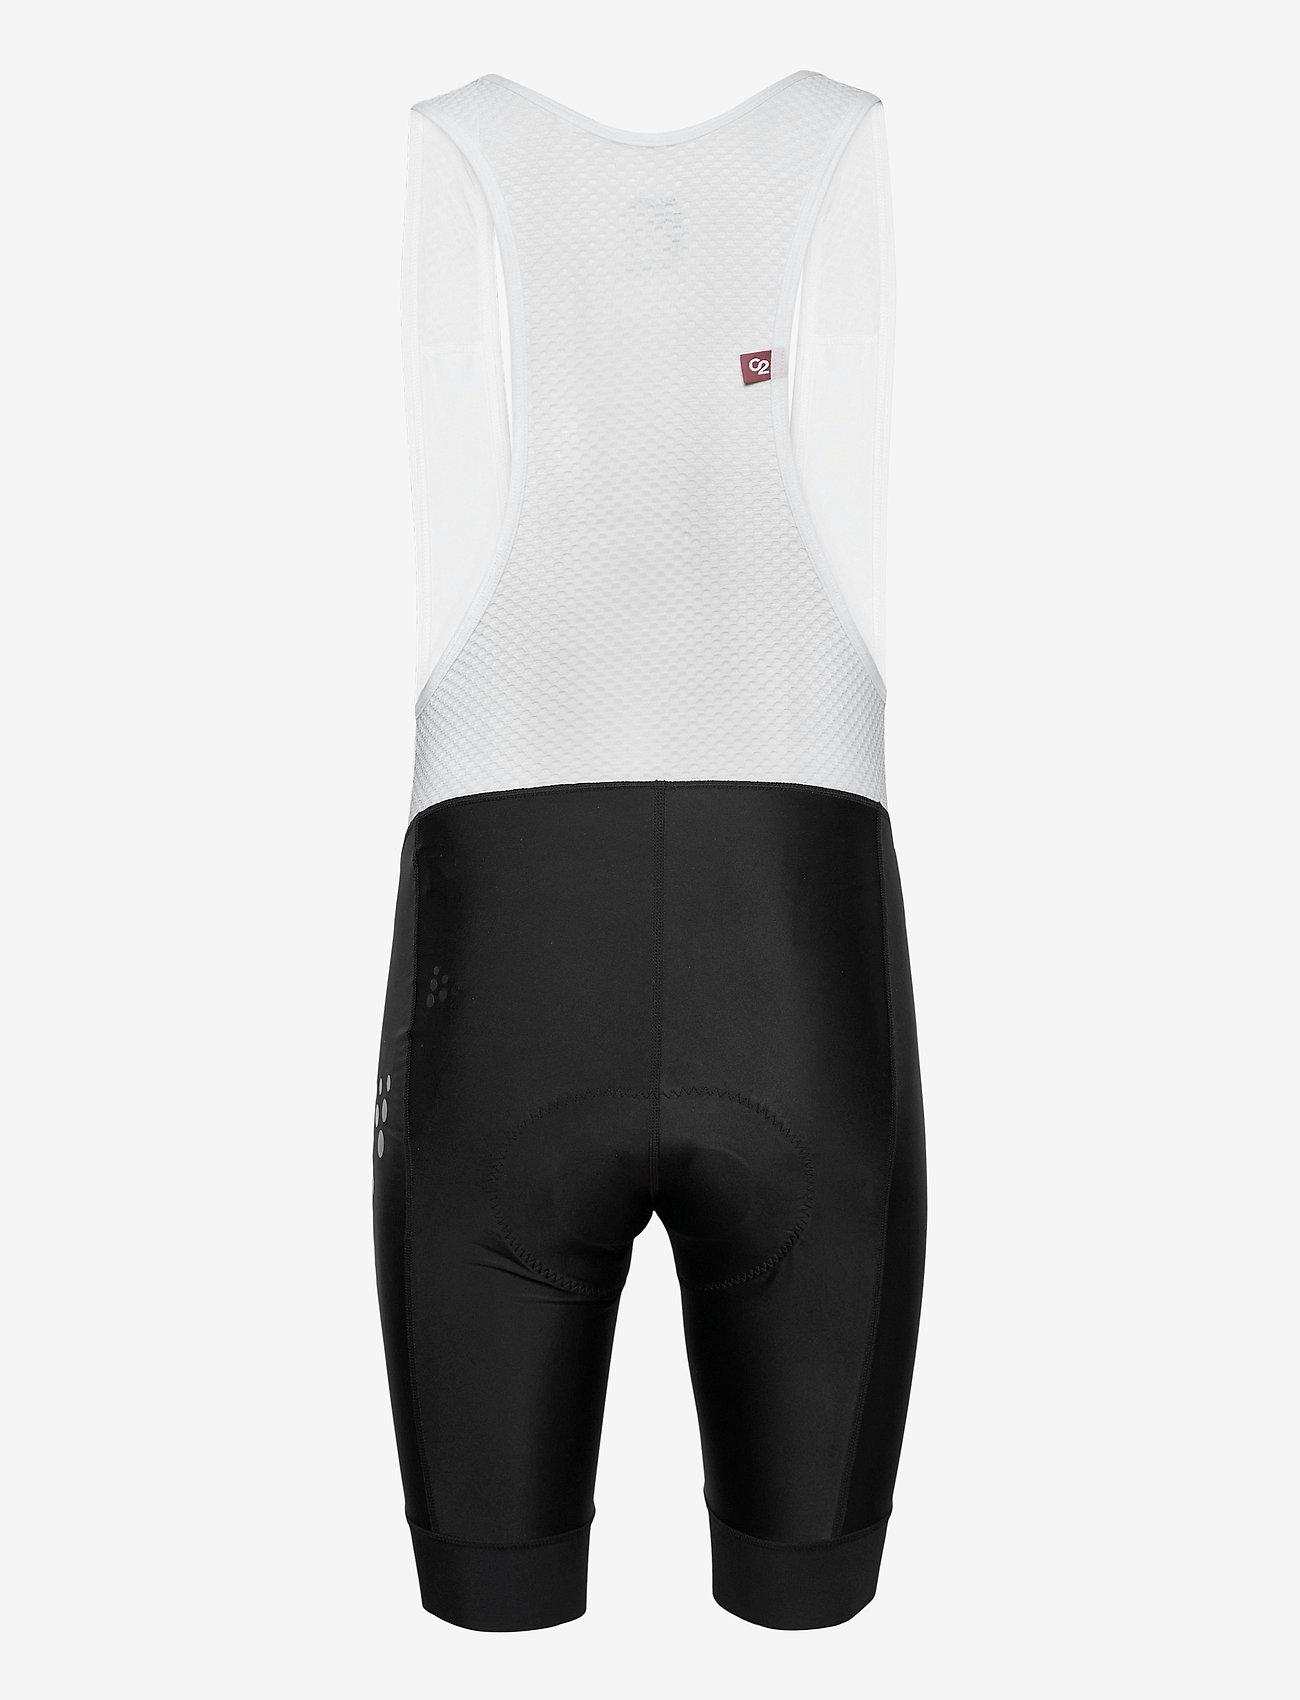 Craft - Adv Endur Bib Shorts M - cycling shorts & tights - black-white - 1